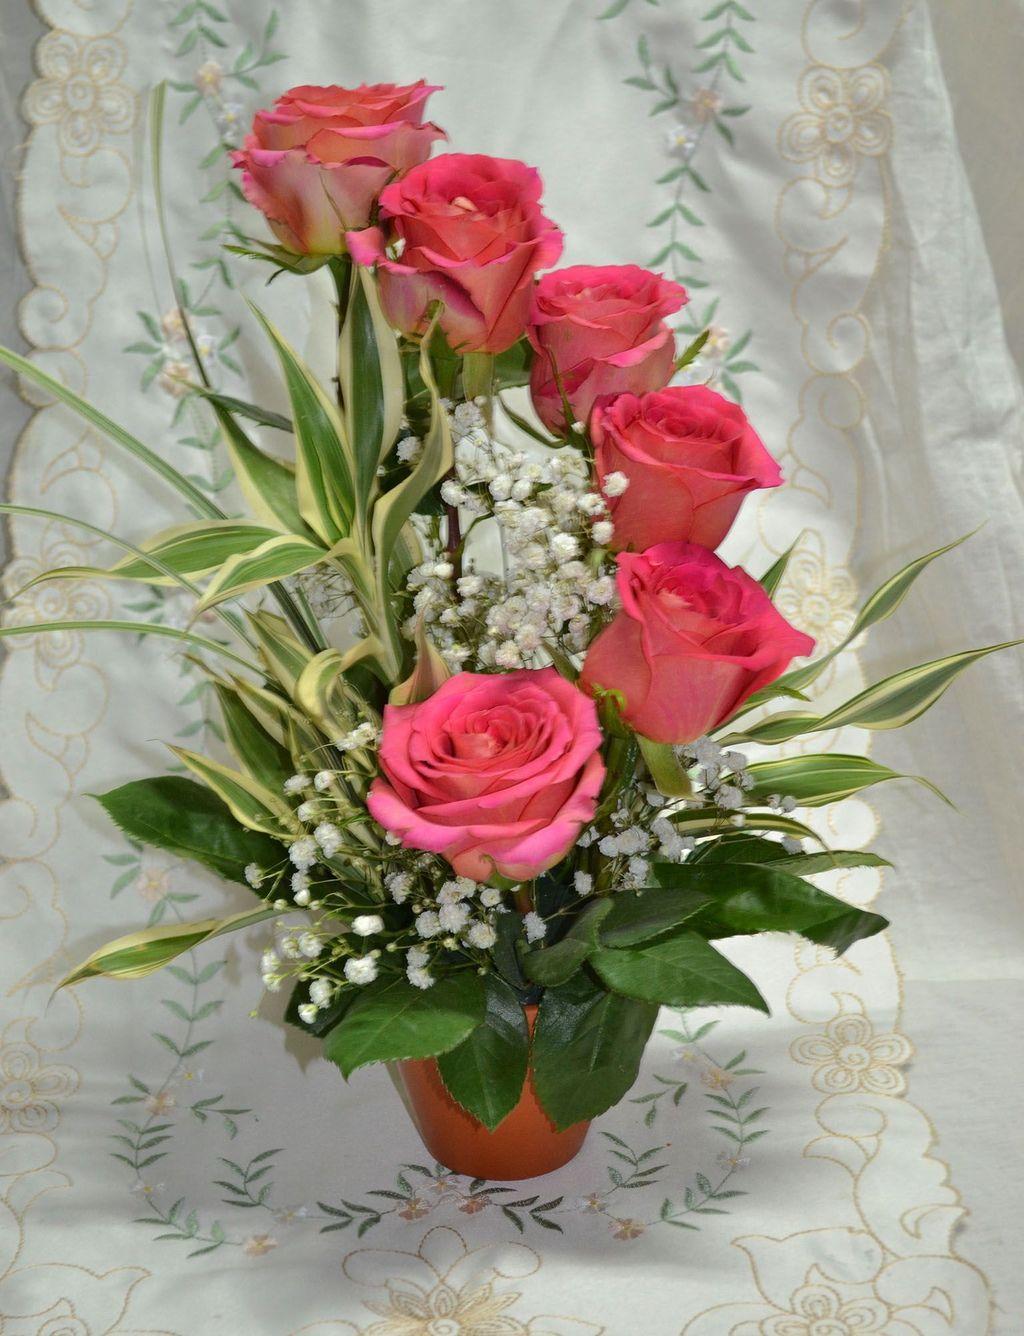 Beautiful Spring Floral Arrangements For Home Decoration 19